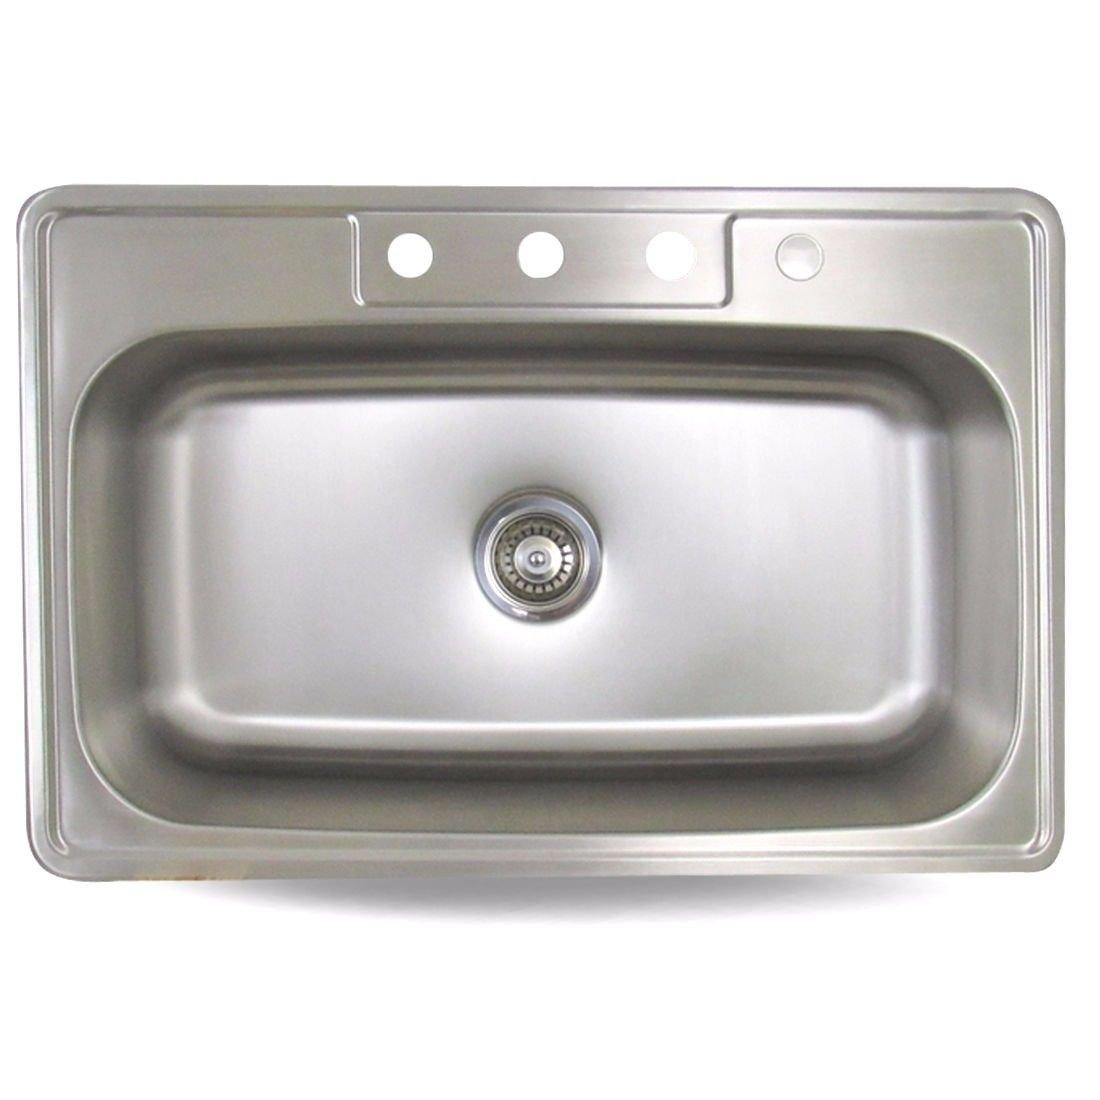 Cheap Single Bowl Kitchen Sink Drop In Find Single Bowl Kitchen